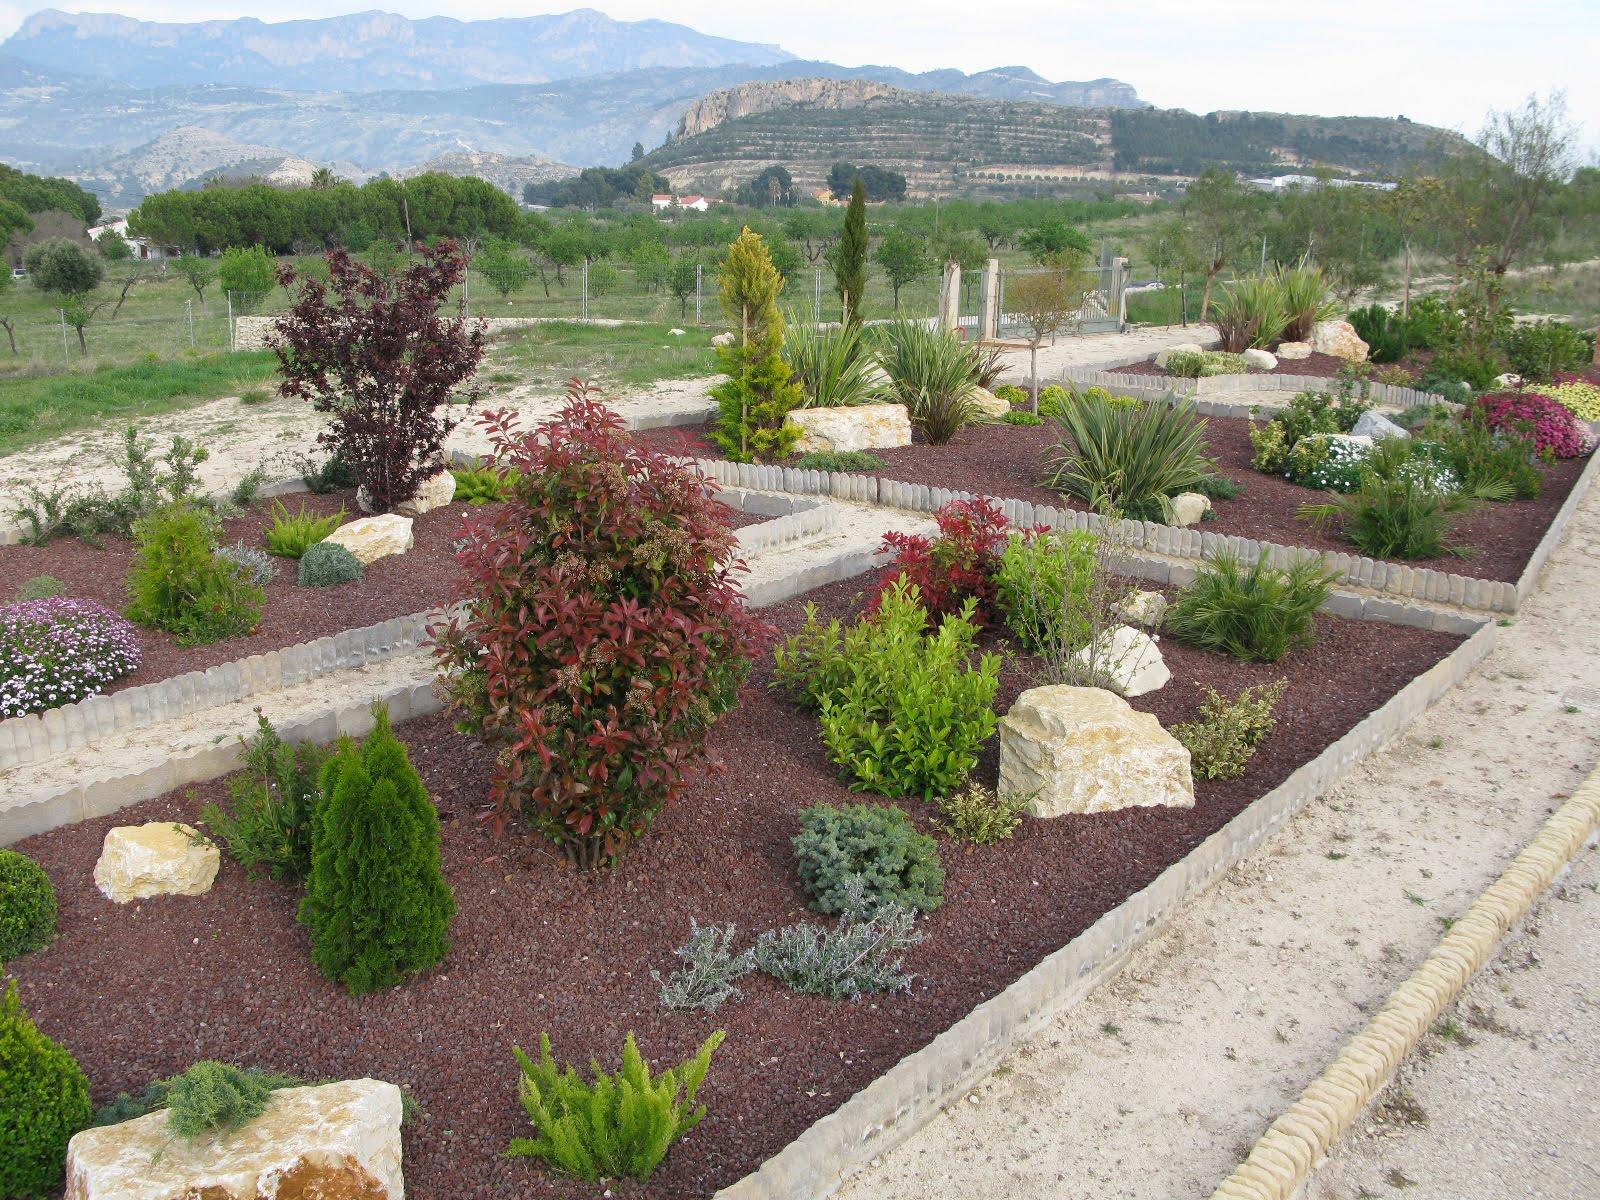 Jard n mediterraneo monta a jardiner a benidorm for Diseno jardin mediterraneo